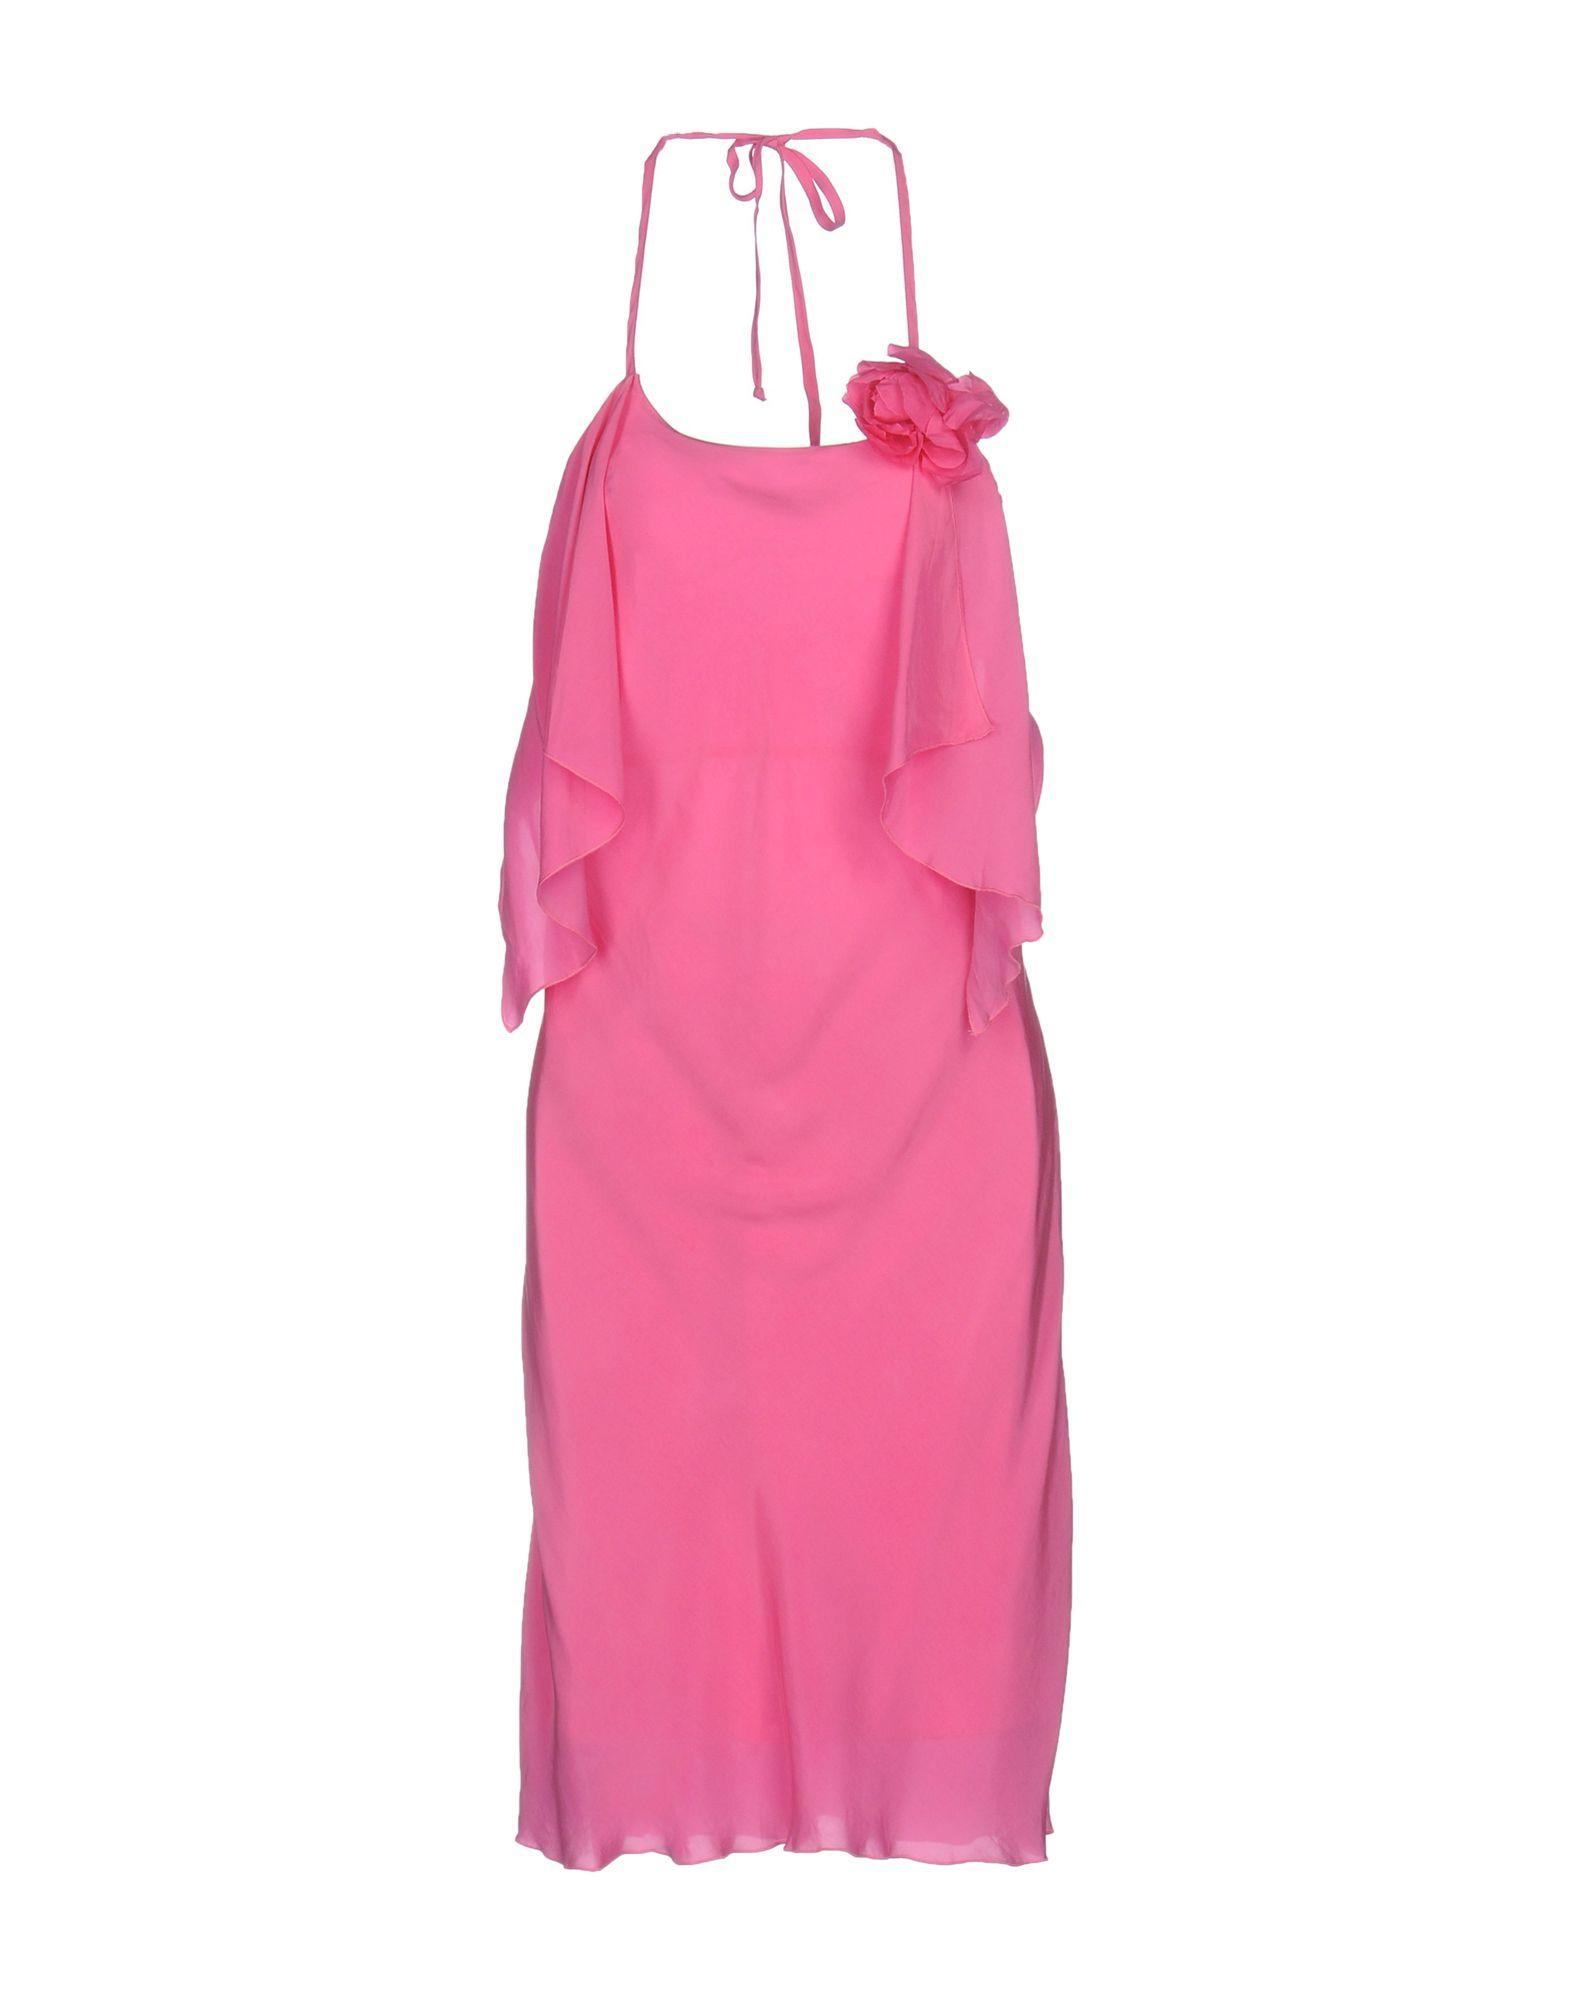 CRISTINAEFFE COLLECTION Платье до колена metal hose nozzle high pressure water spray gun sprayer garden auto car washing